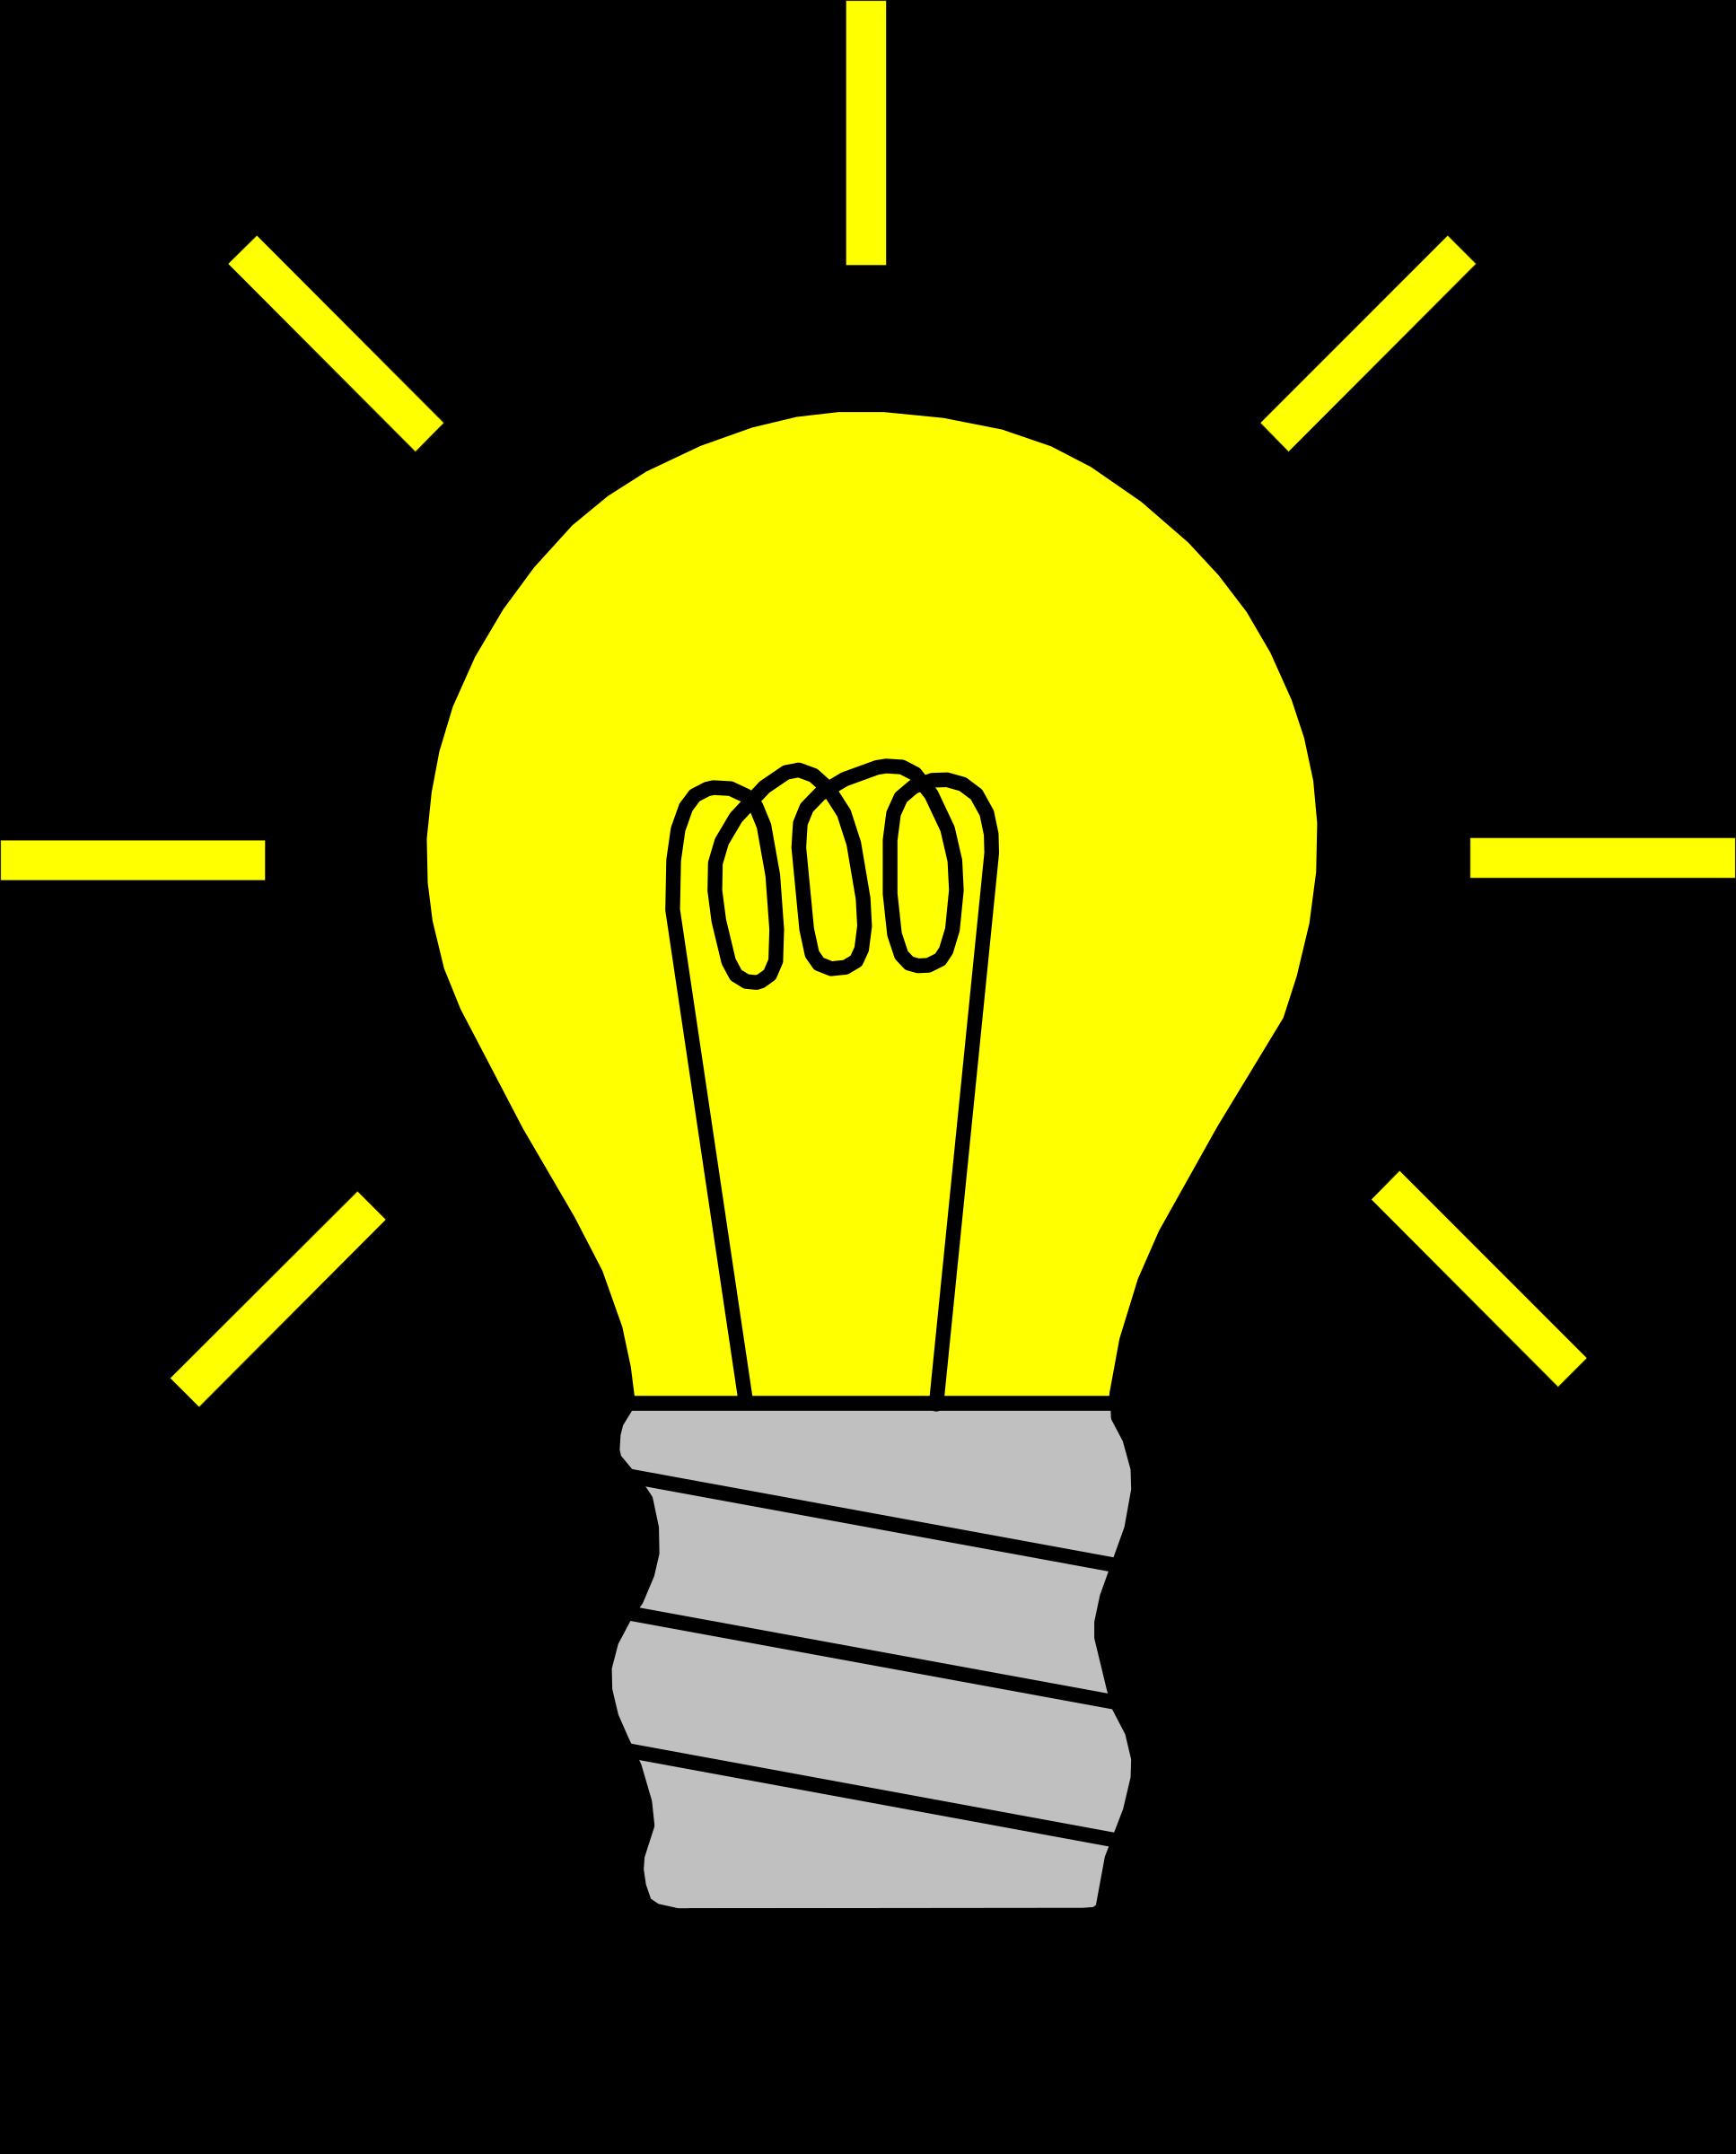 Light bulb on big. Thoughts clipart lighbulb